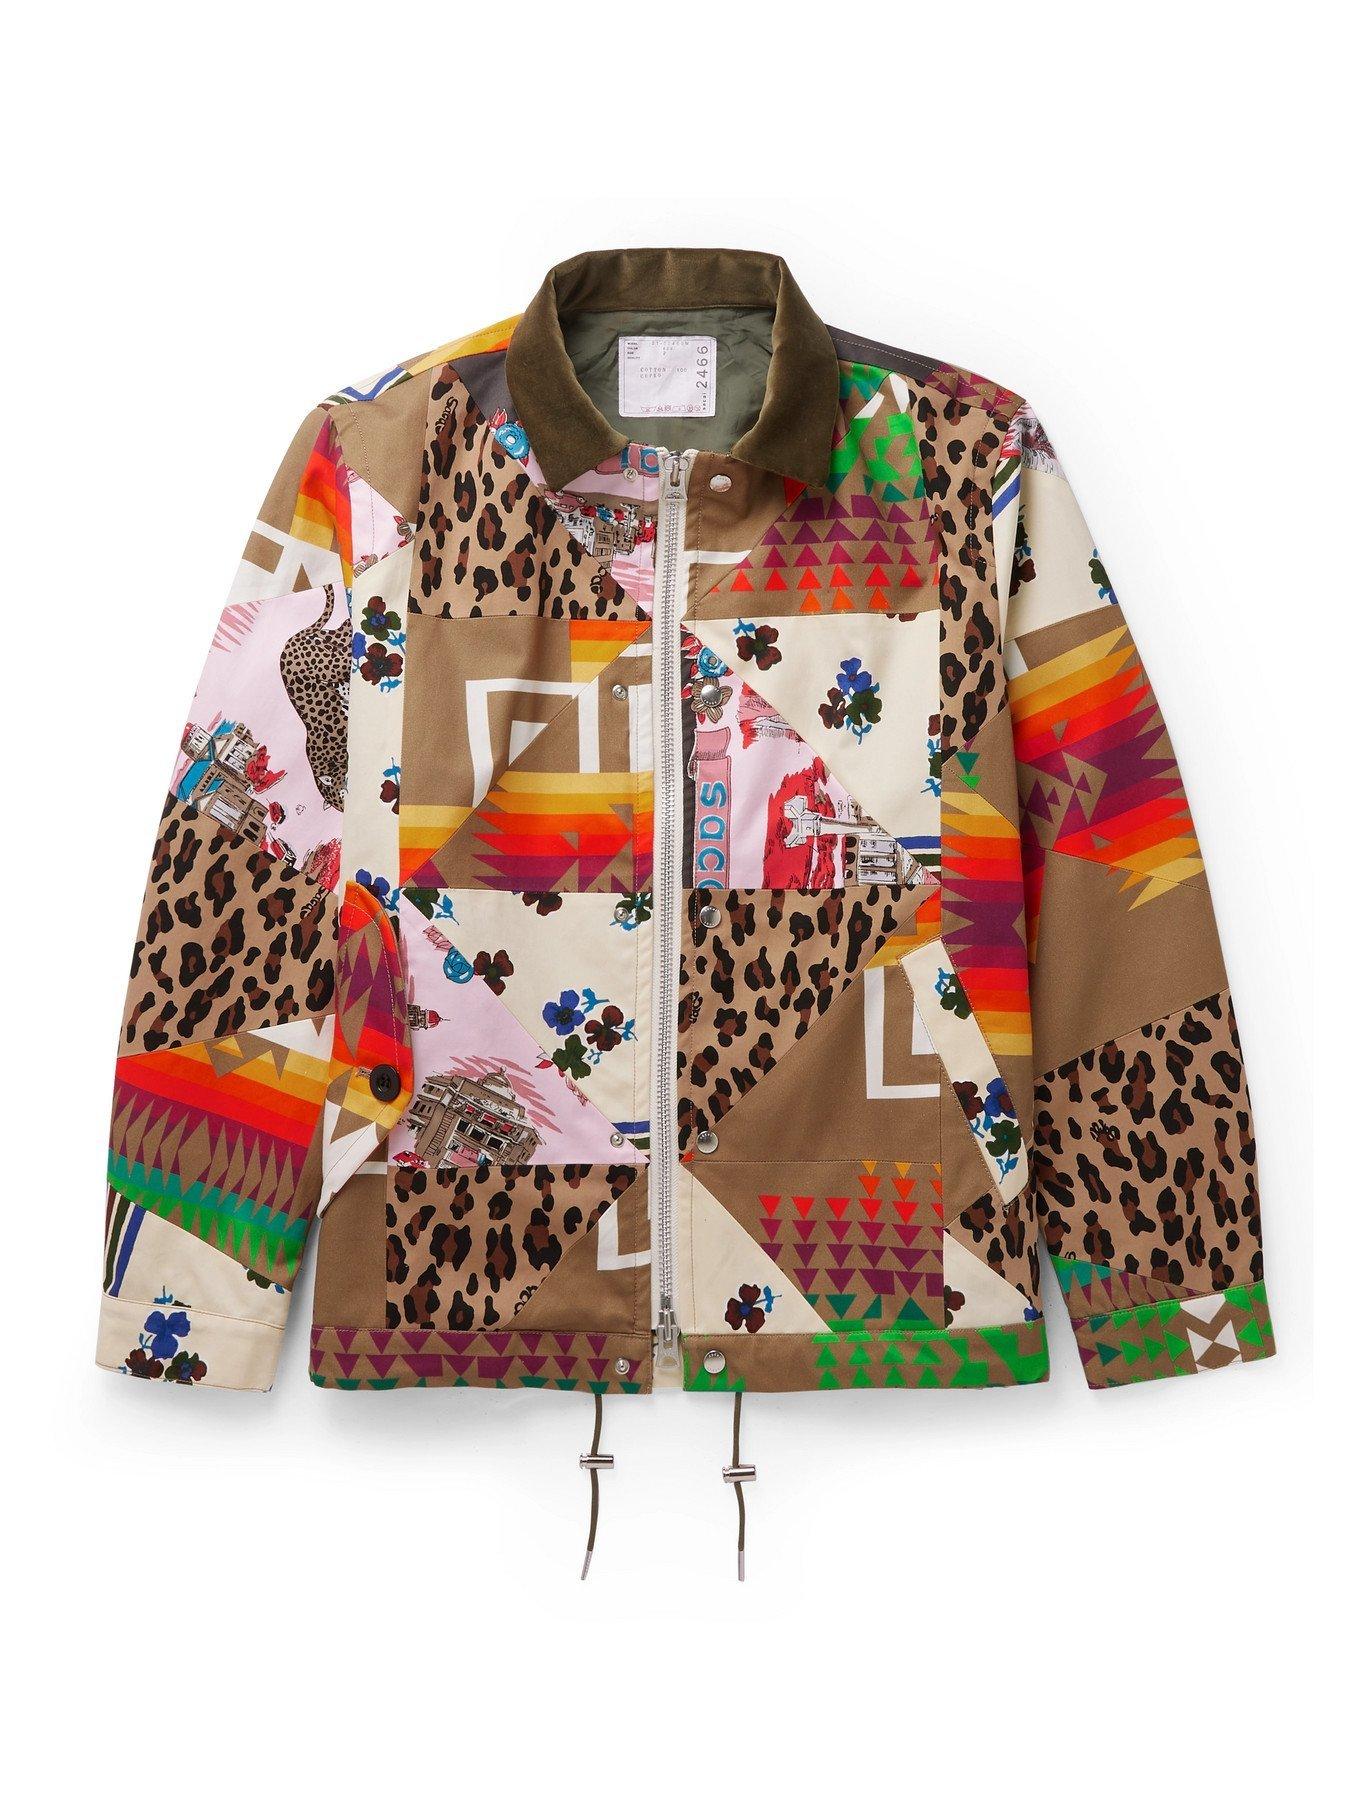 SACAI - Hank Willis Thomas Velvet-Trimmed Printed Cotton Bomber Jacket - Multi